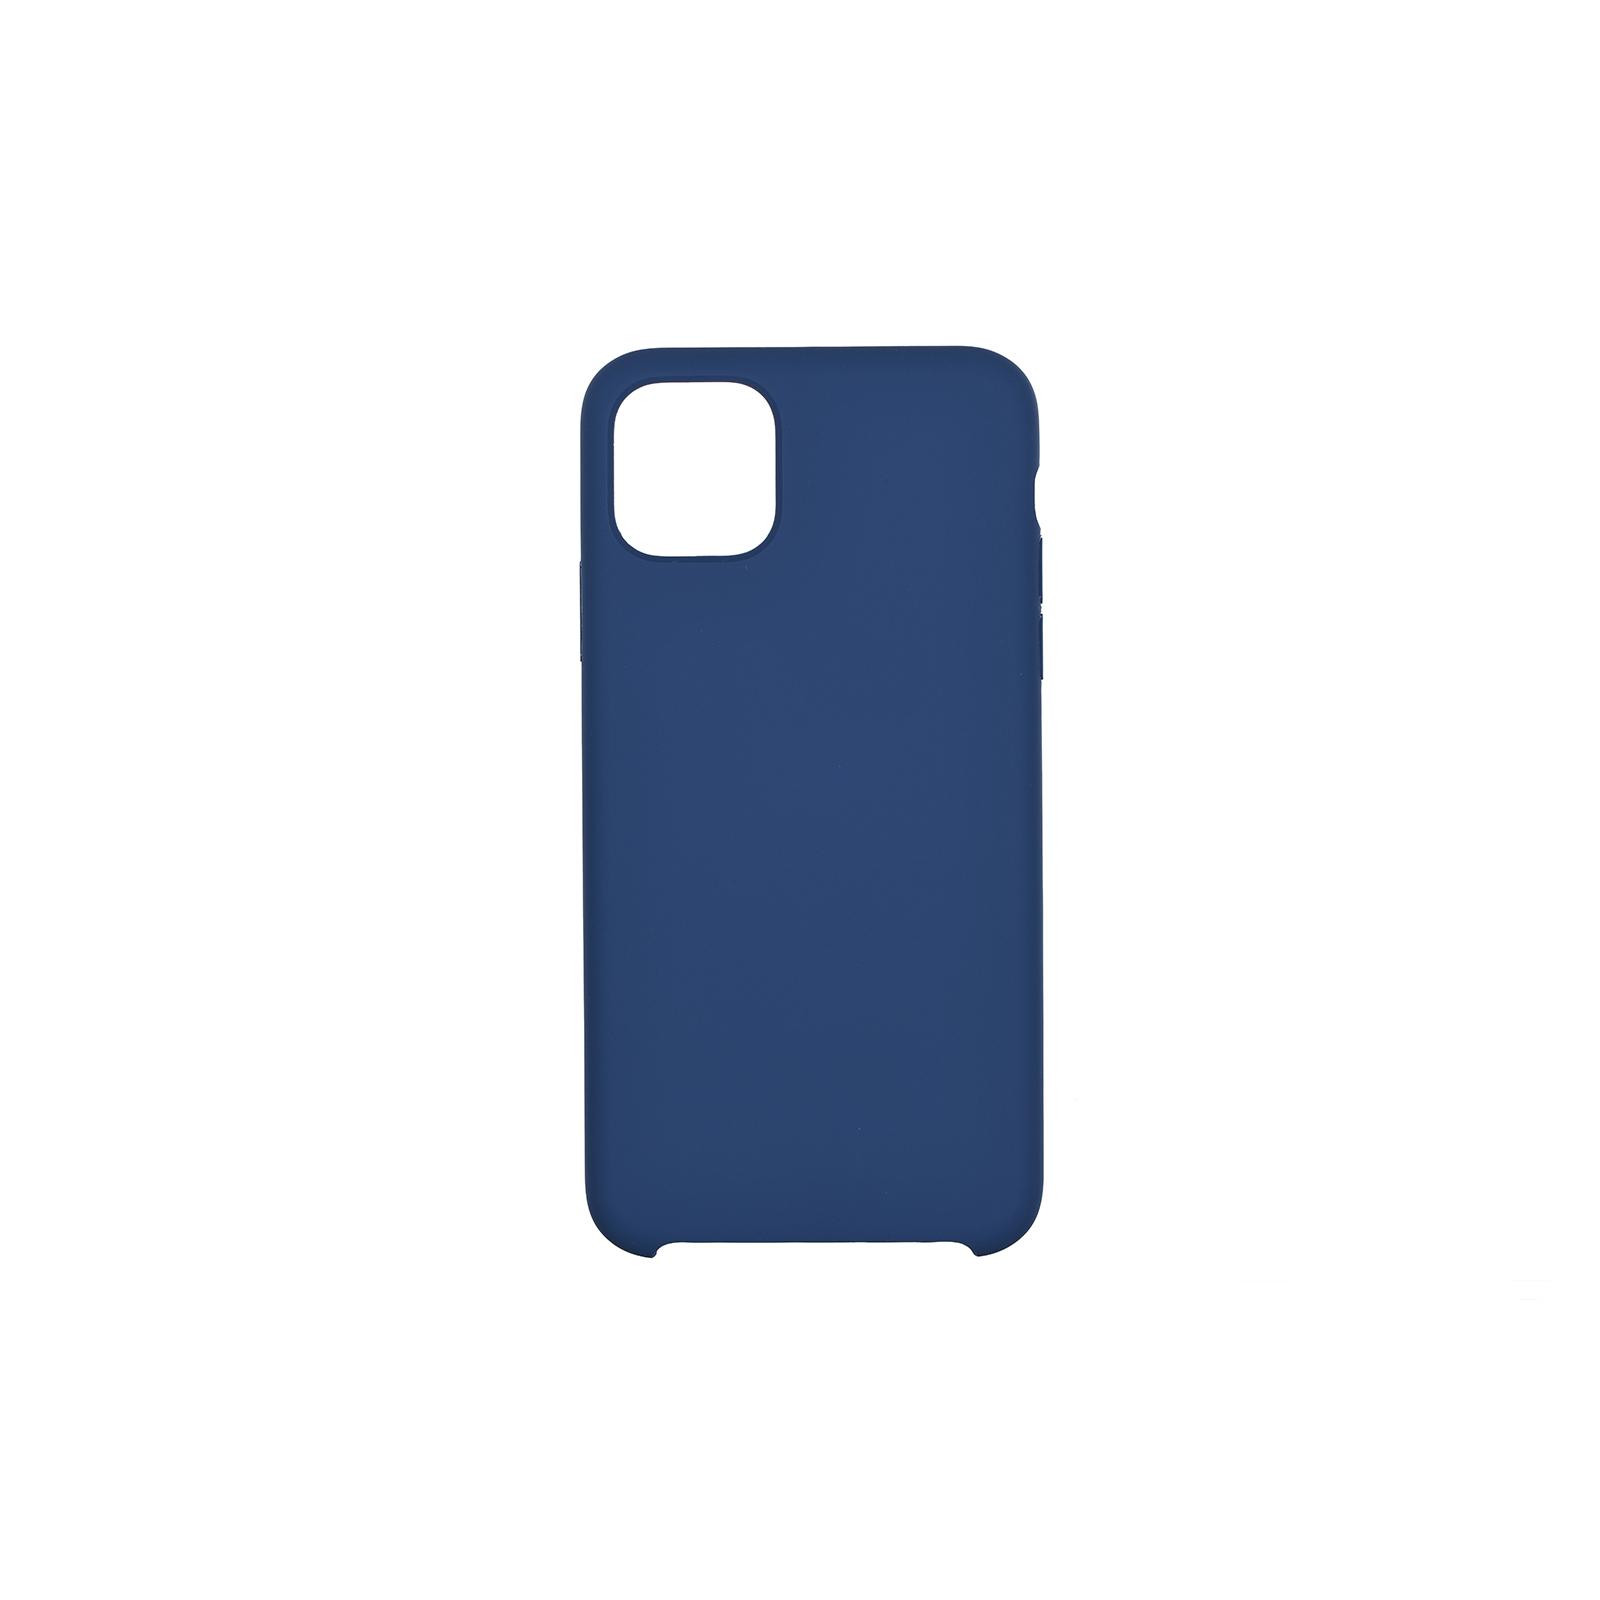 "Чехол для моб. телефона 2E Apple iPhone 11 Pro Max (6.5""), Liquid Silicone, Navy (2E-IPH-11PRM-OCLS-NV)"